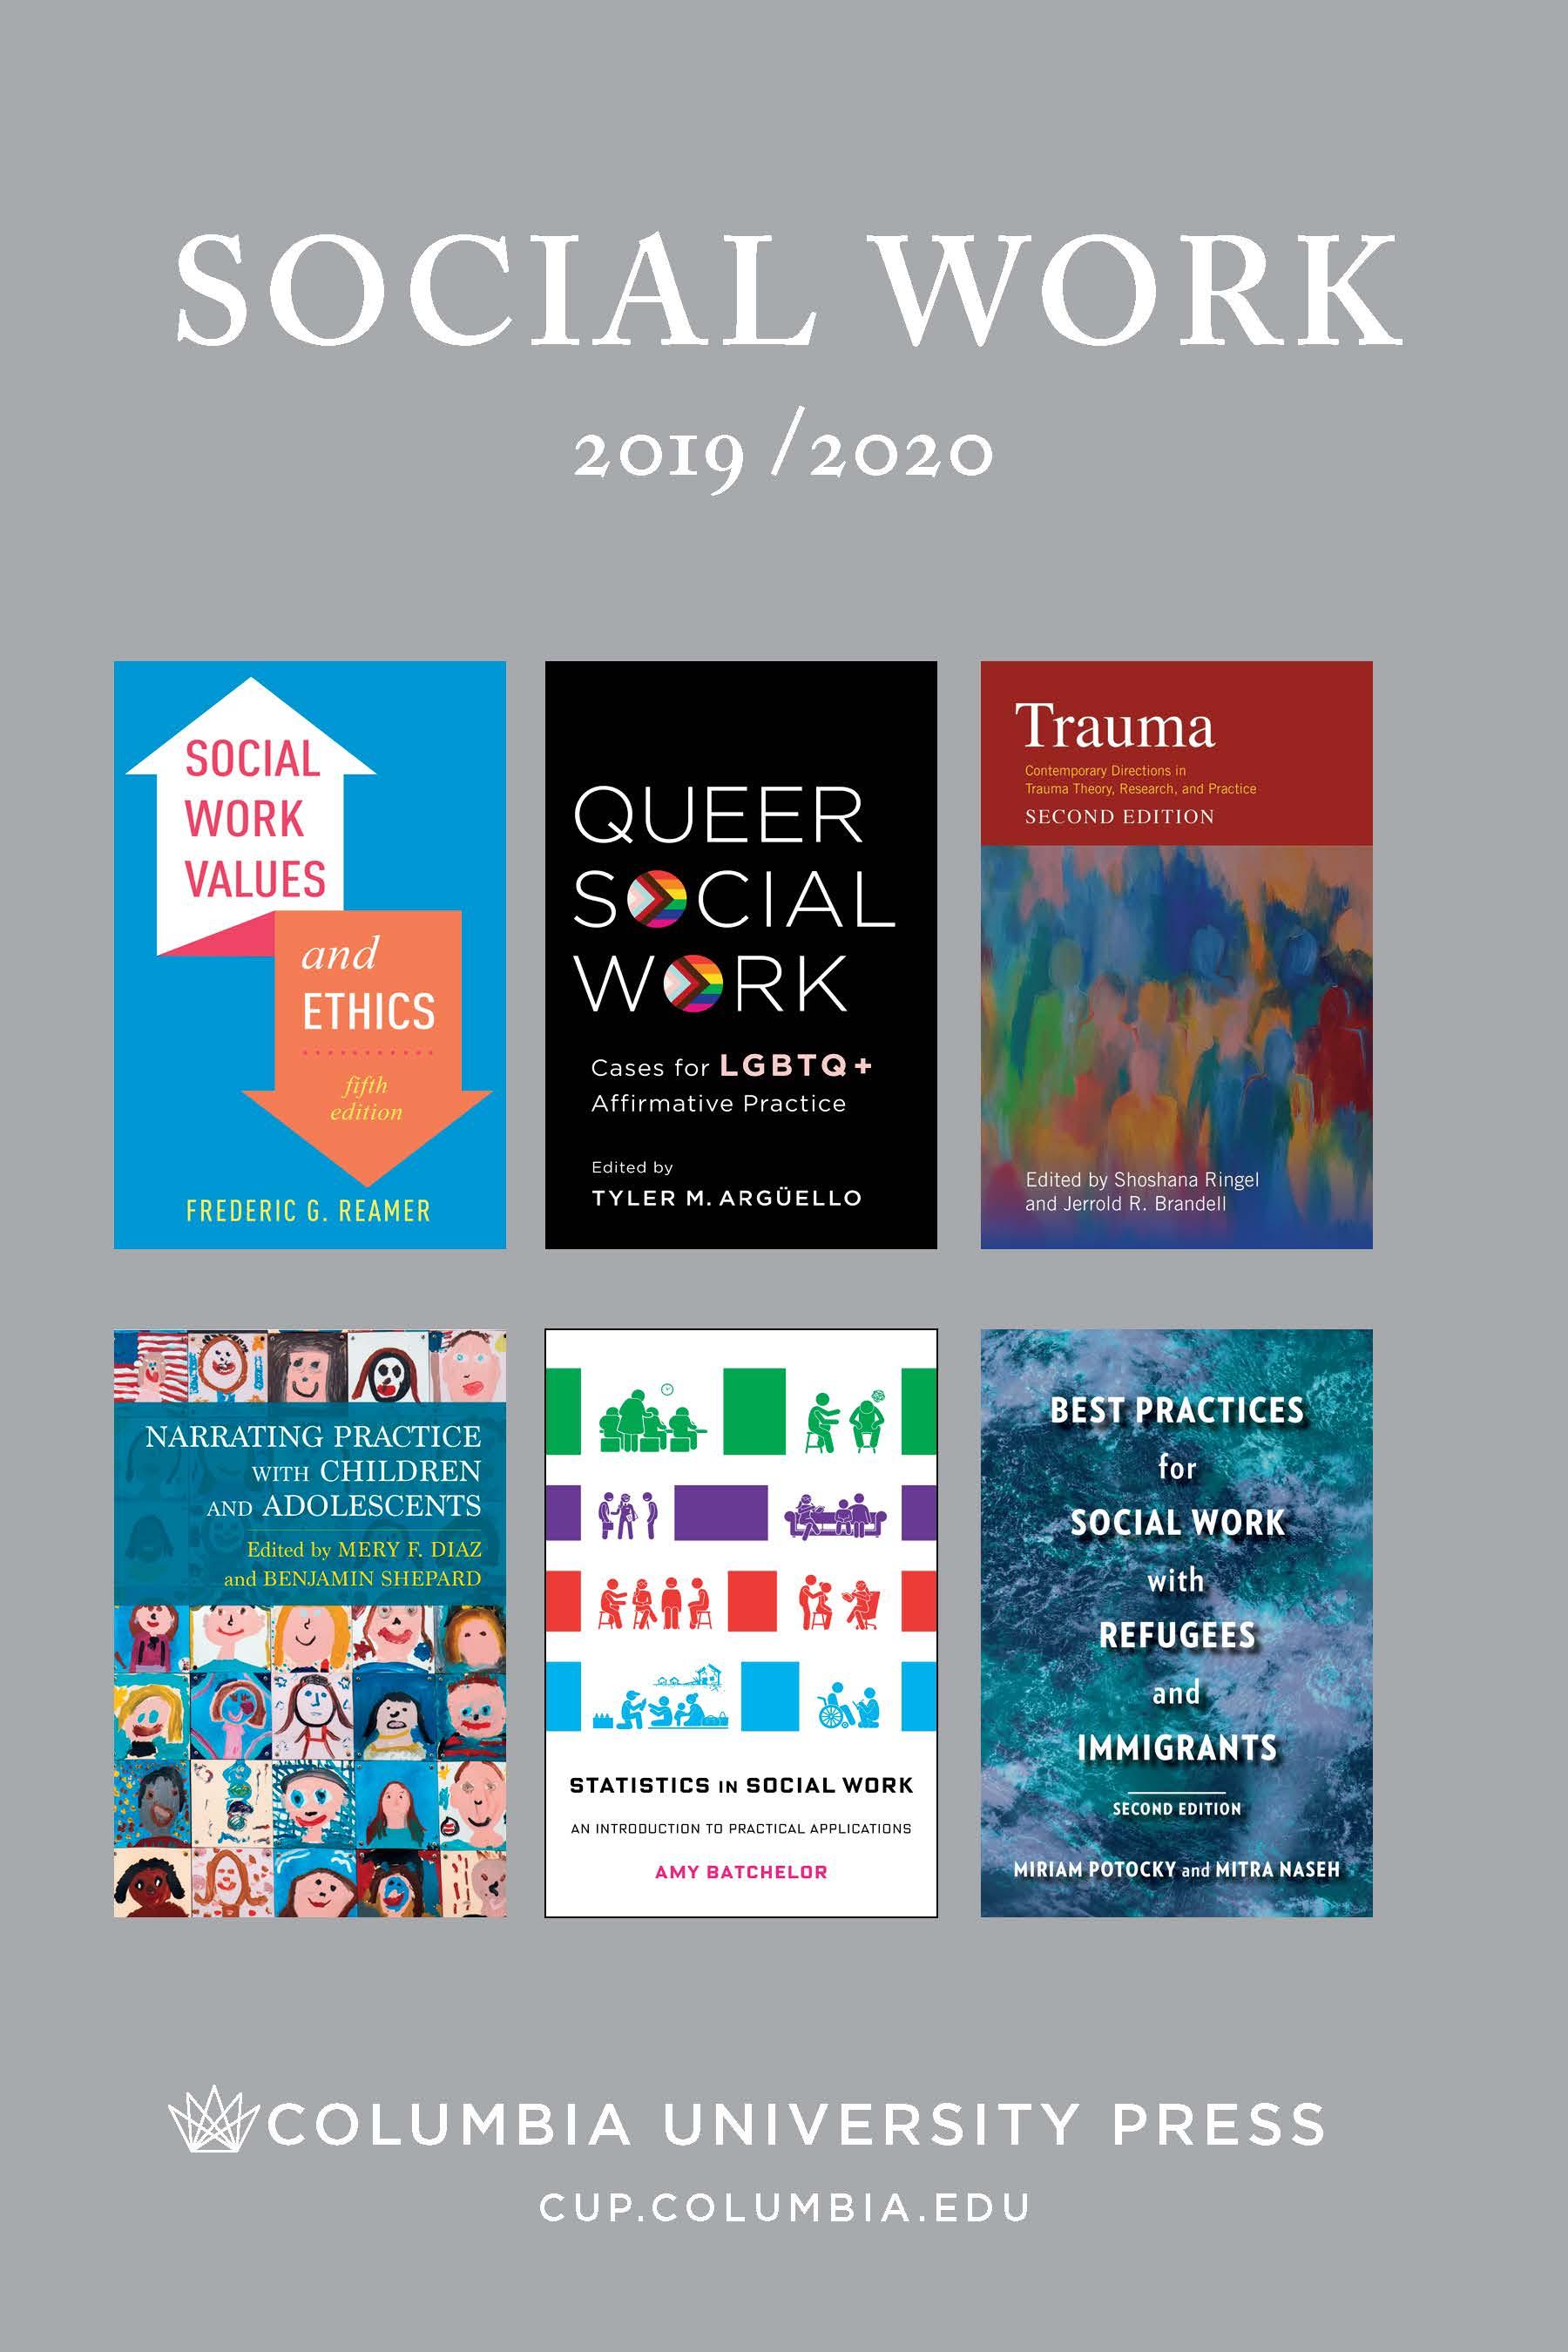 2019/2020 Social Work Catalog